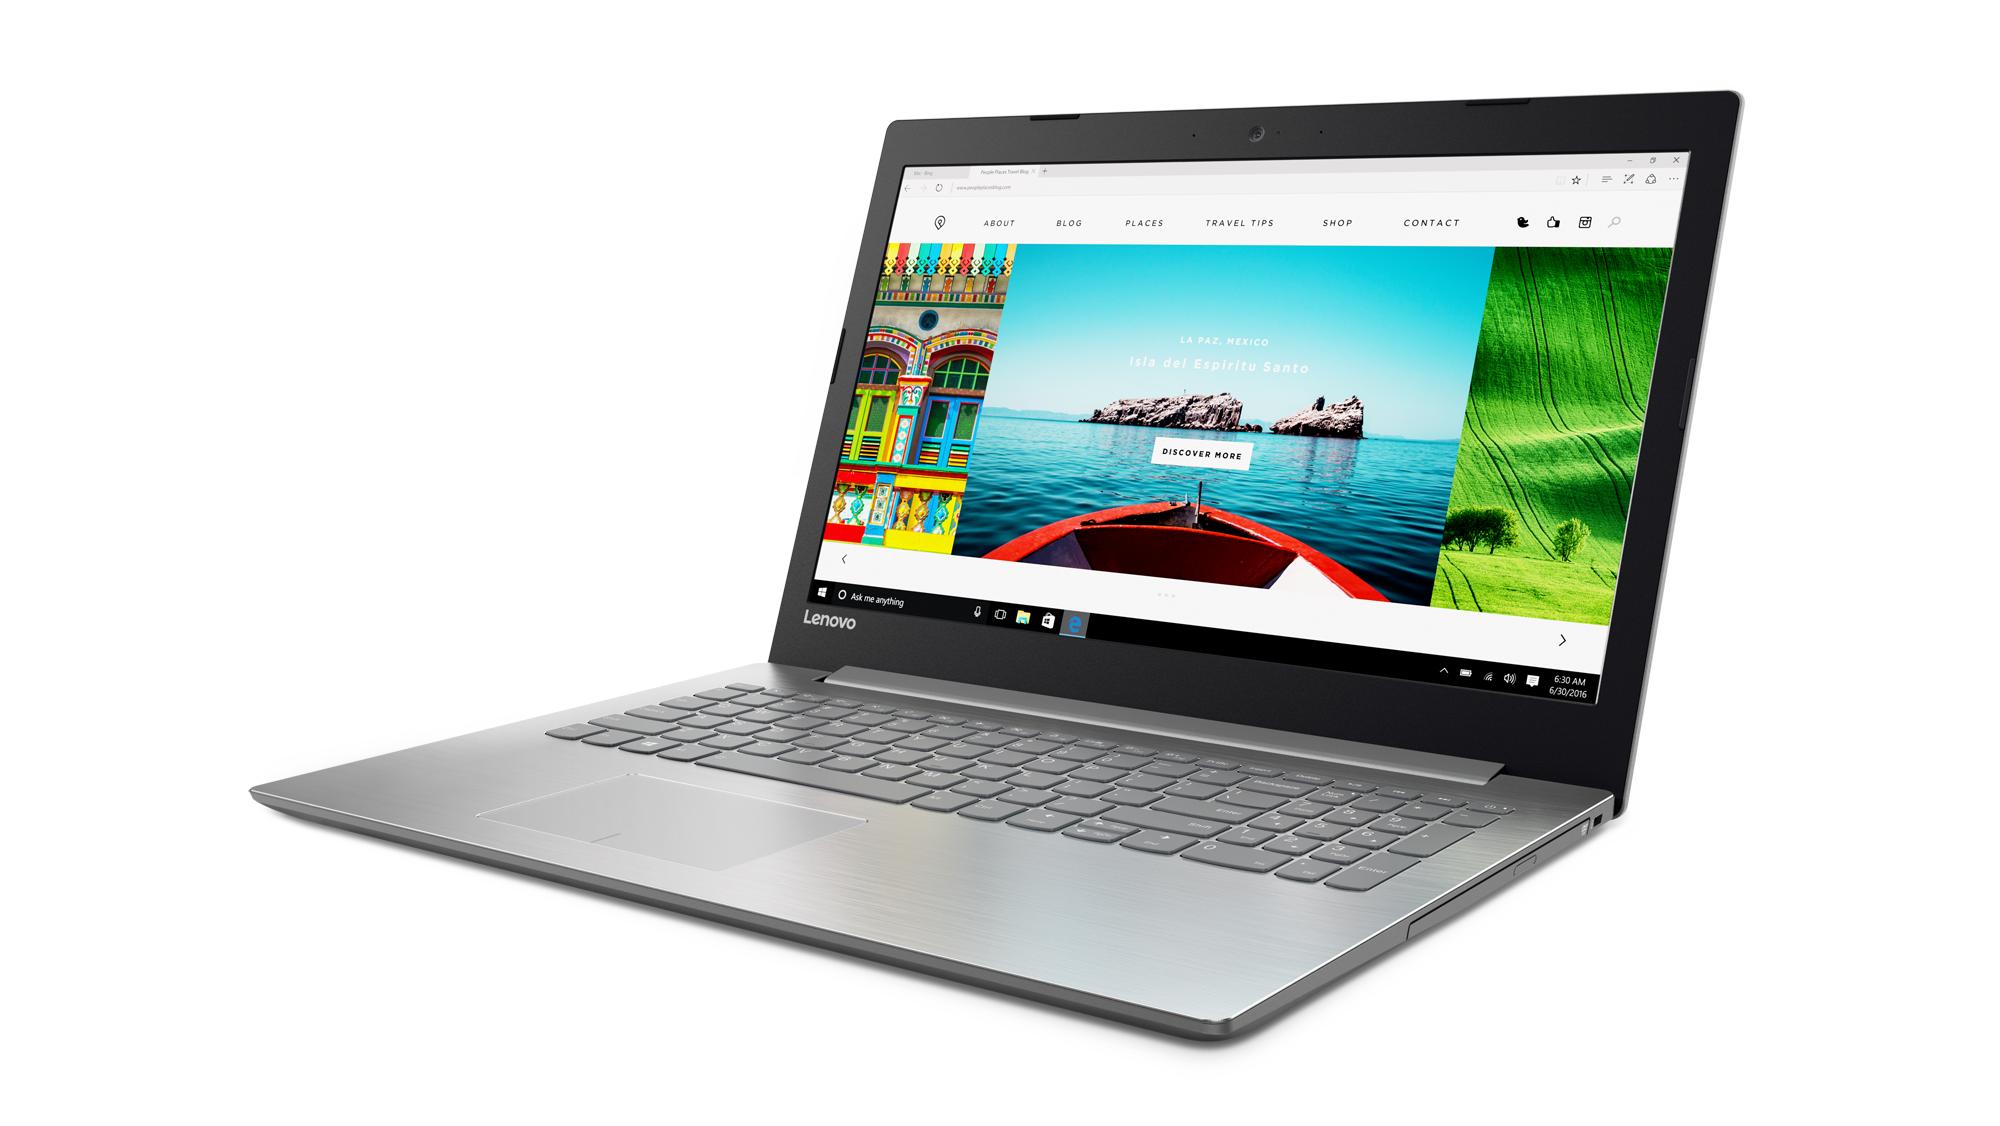 "Lenovo IdeaPad 320-15ISK i3-6006U 3,10GHz/6GB/SSD 256GB/15,6"" FHD/AG/WIN10 šedá 80XH003RCK"